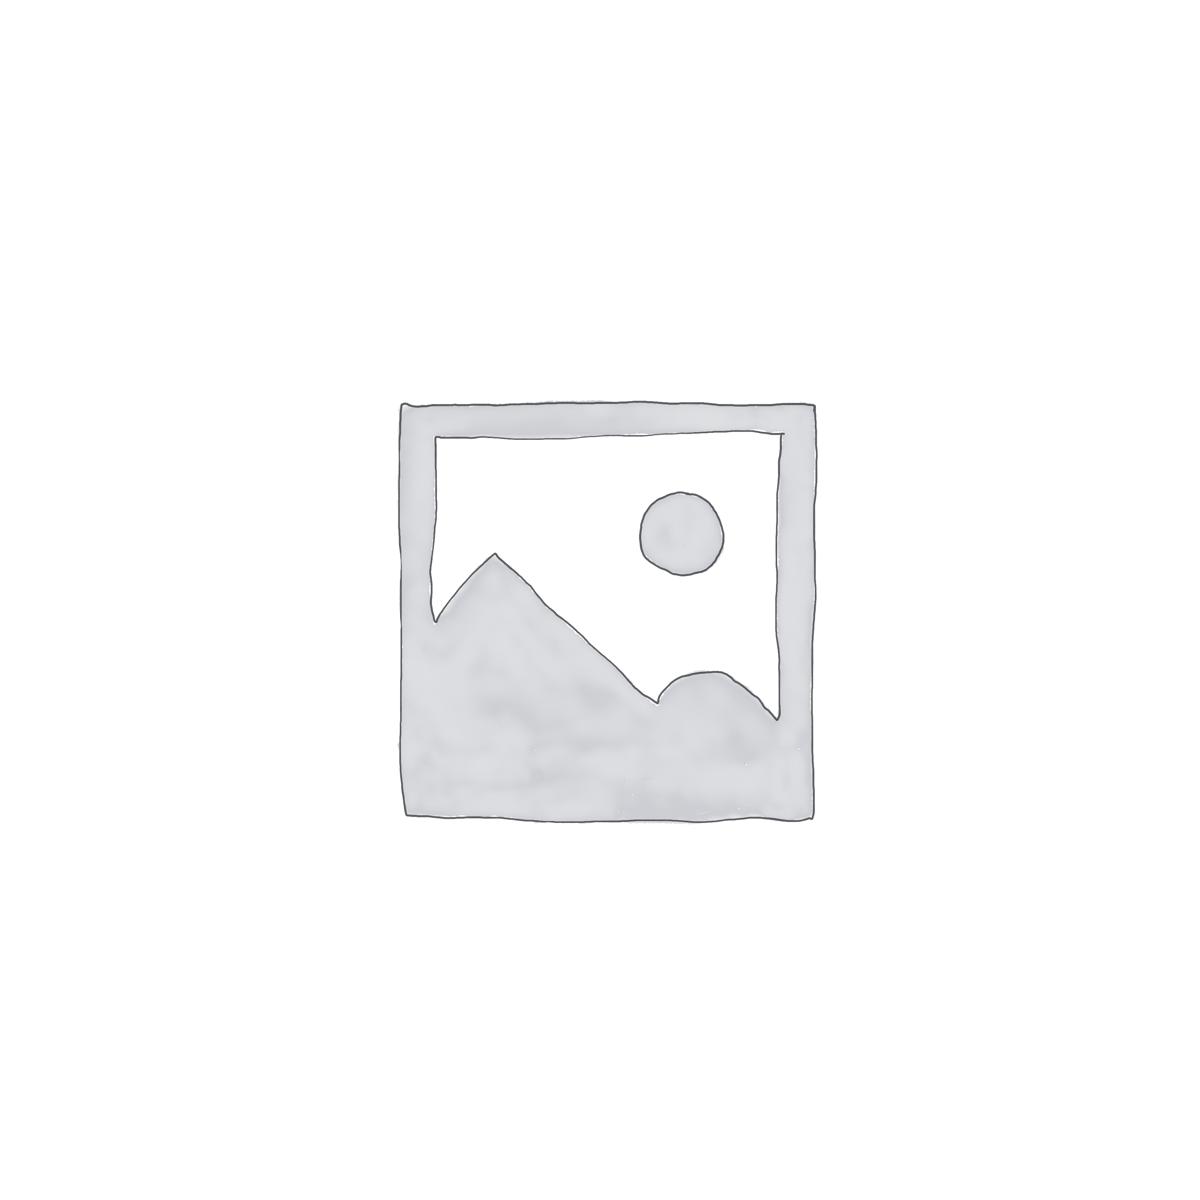 Twigs and Berries Wallpaper Mural